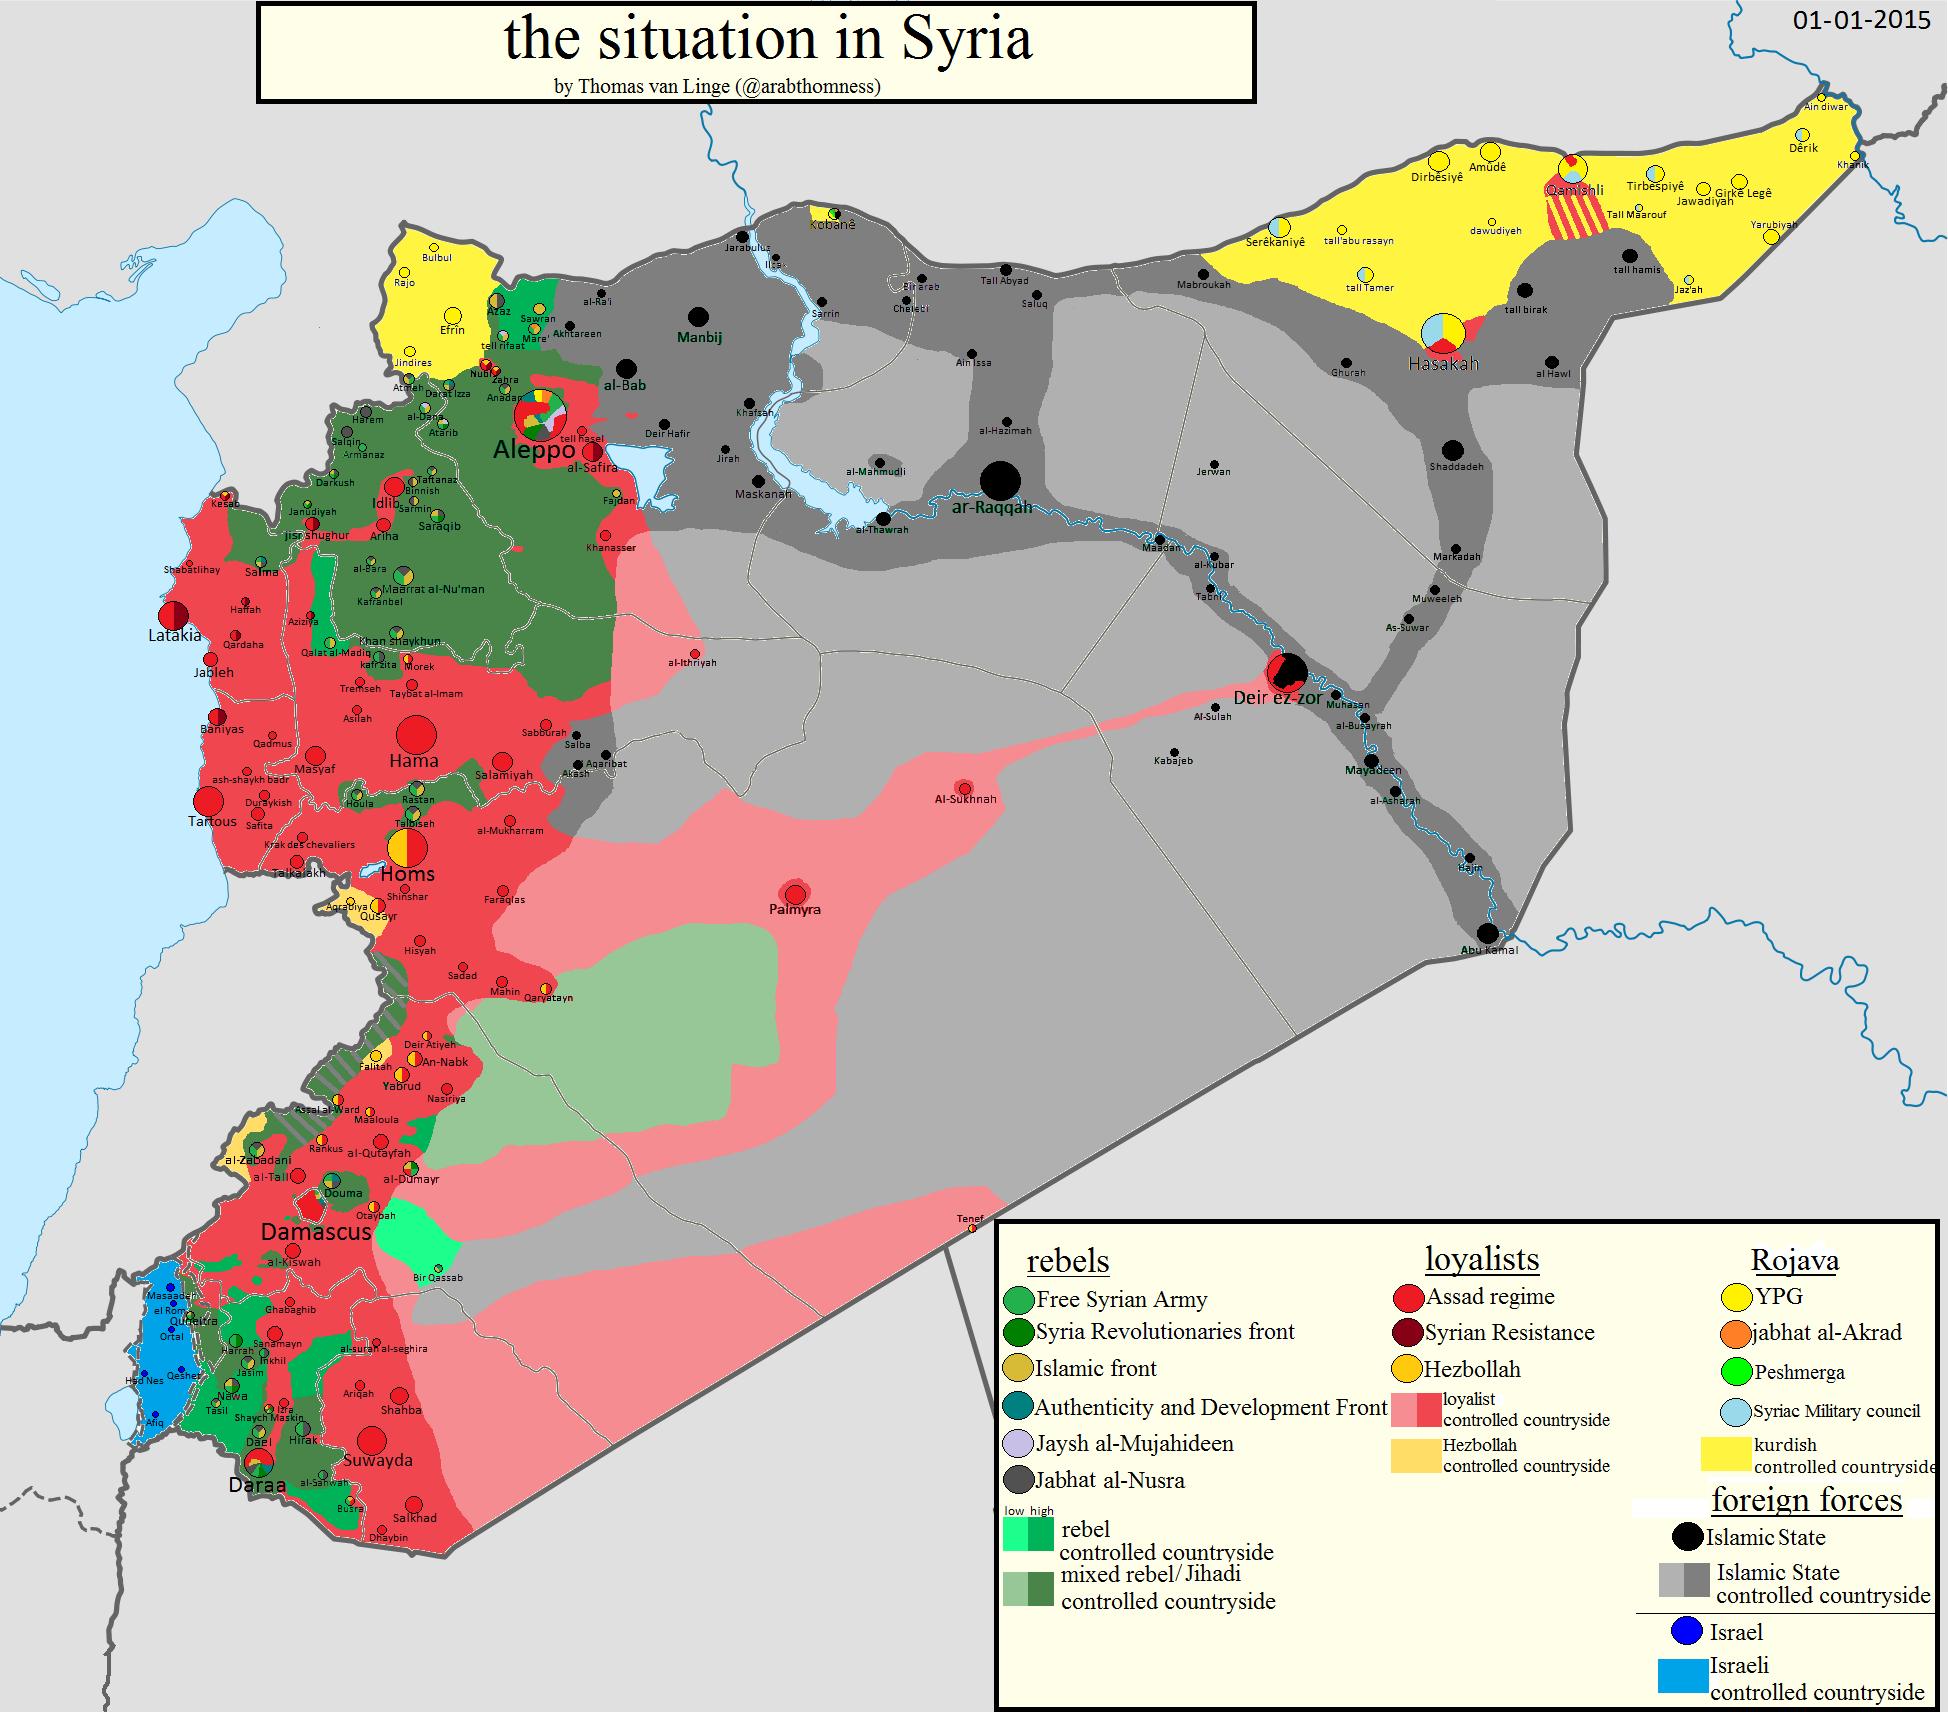 http://www.les-crises.fr/wp-content/uploads/2015/10/31-syrie-01-2015.png